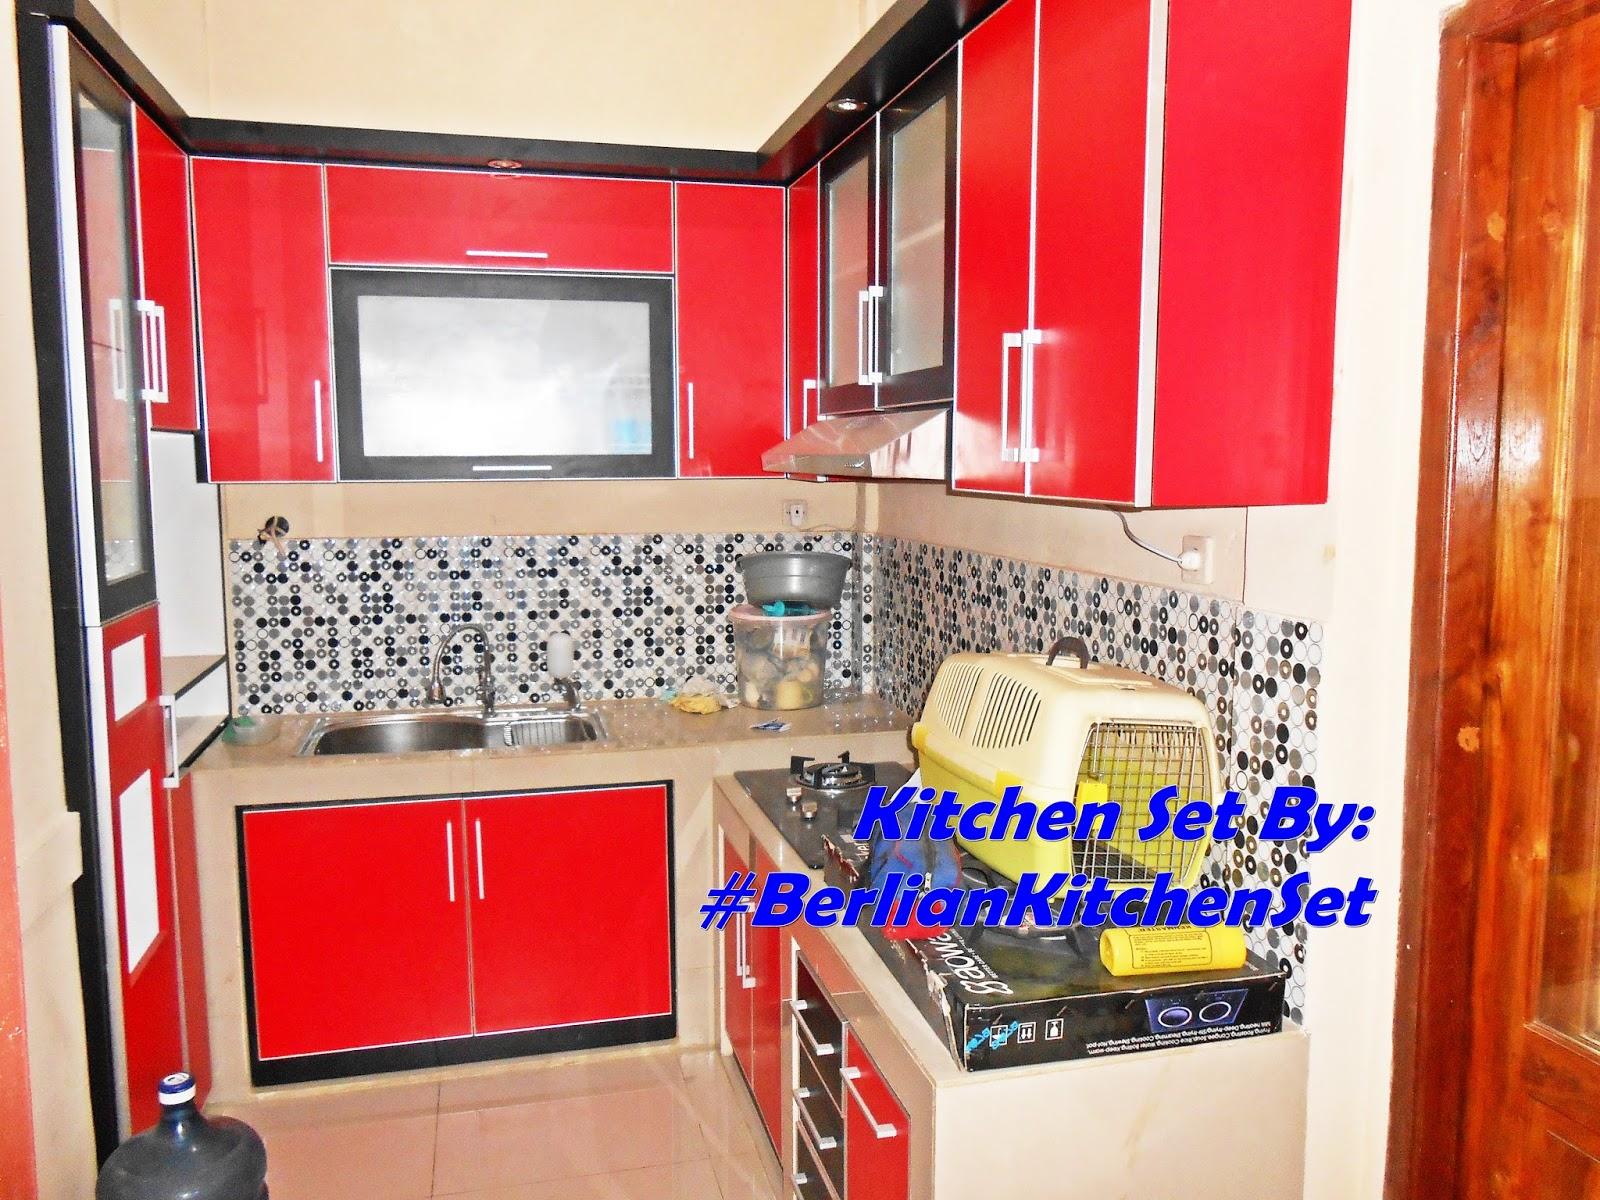 Berlian kitchen set minimalis murah desain ulang dapur anda for Kitchen set bawah